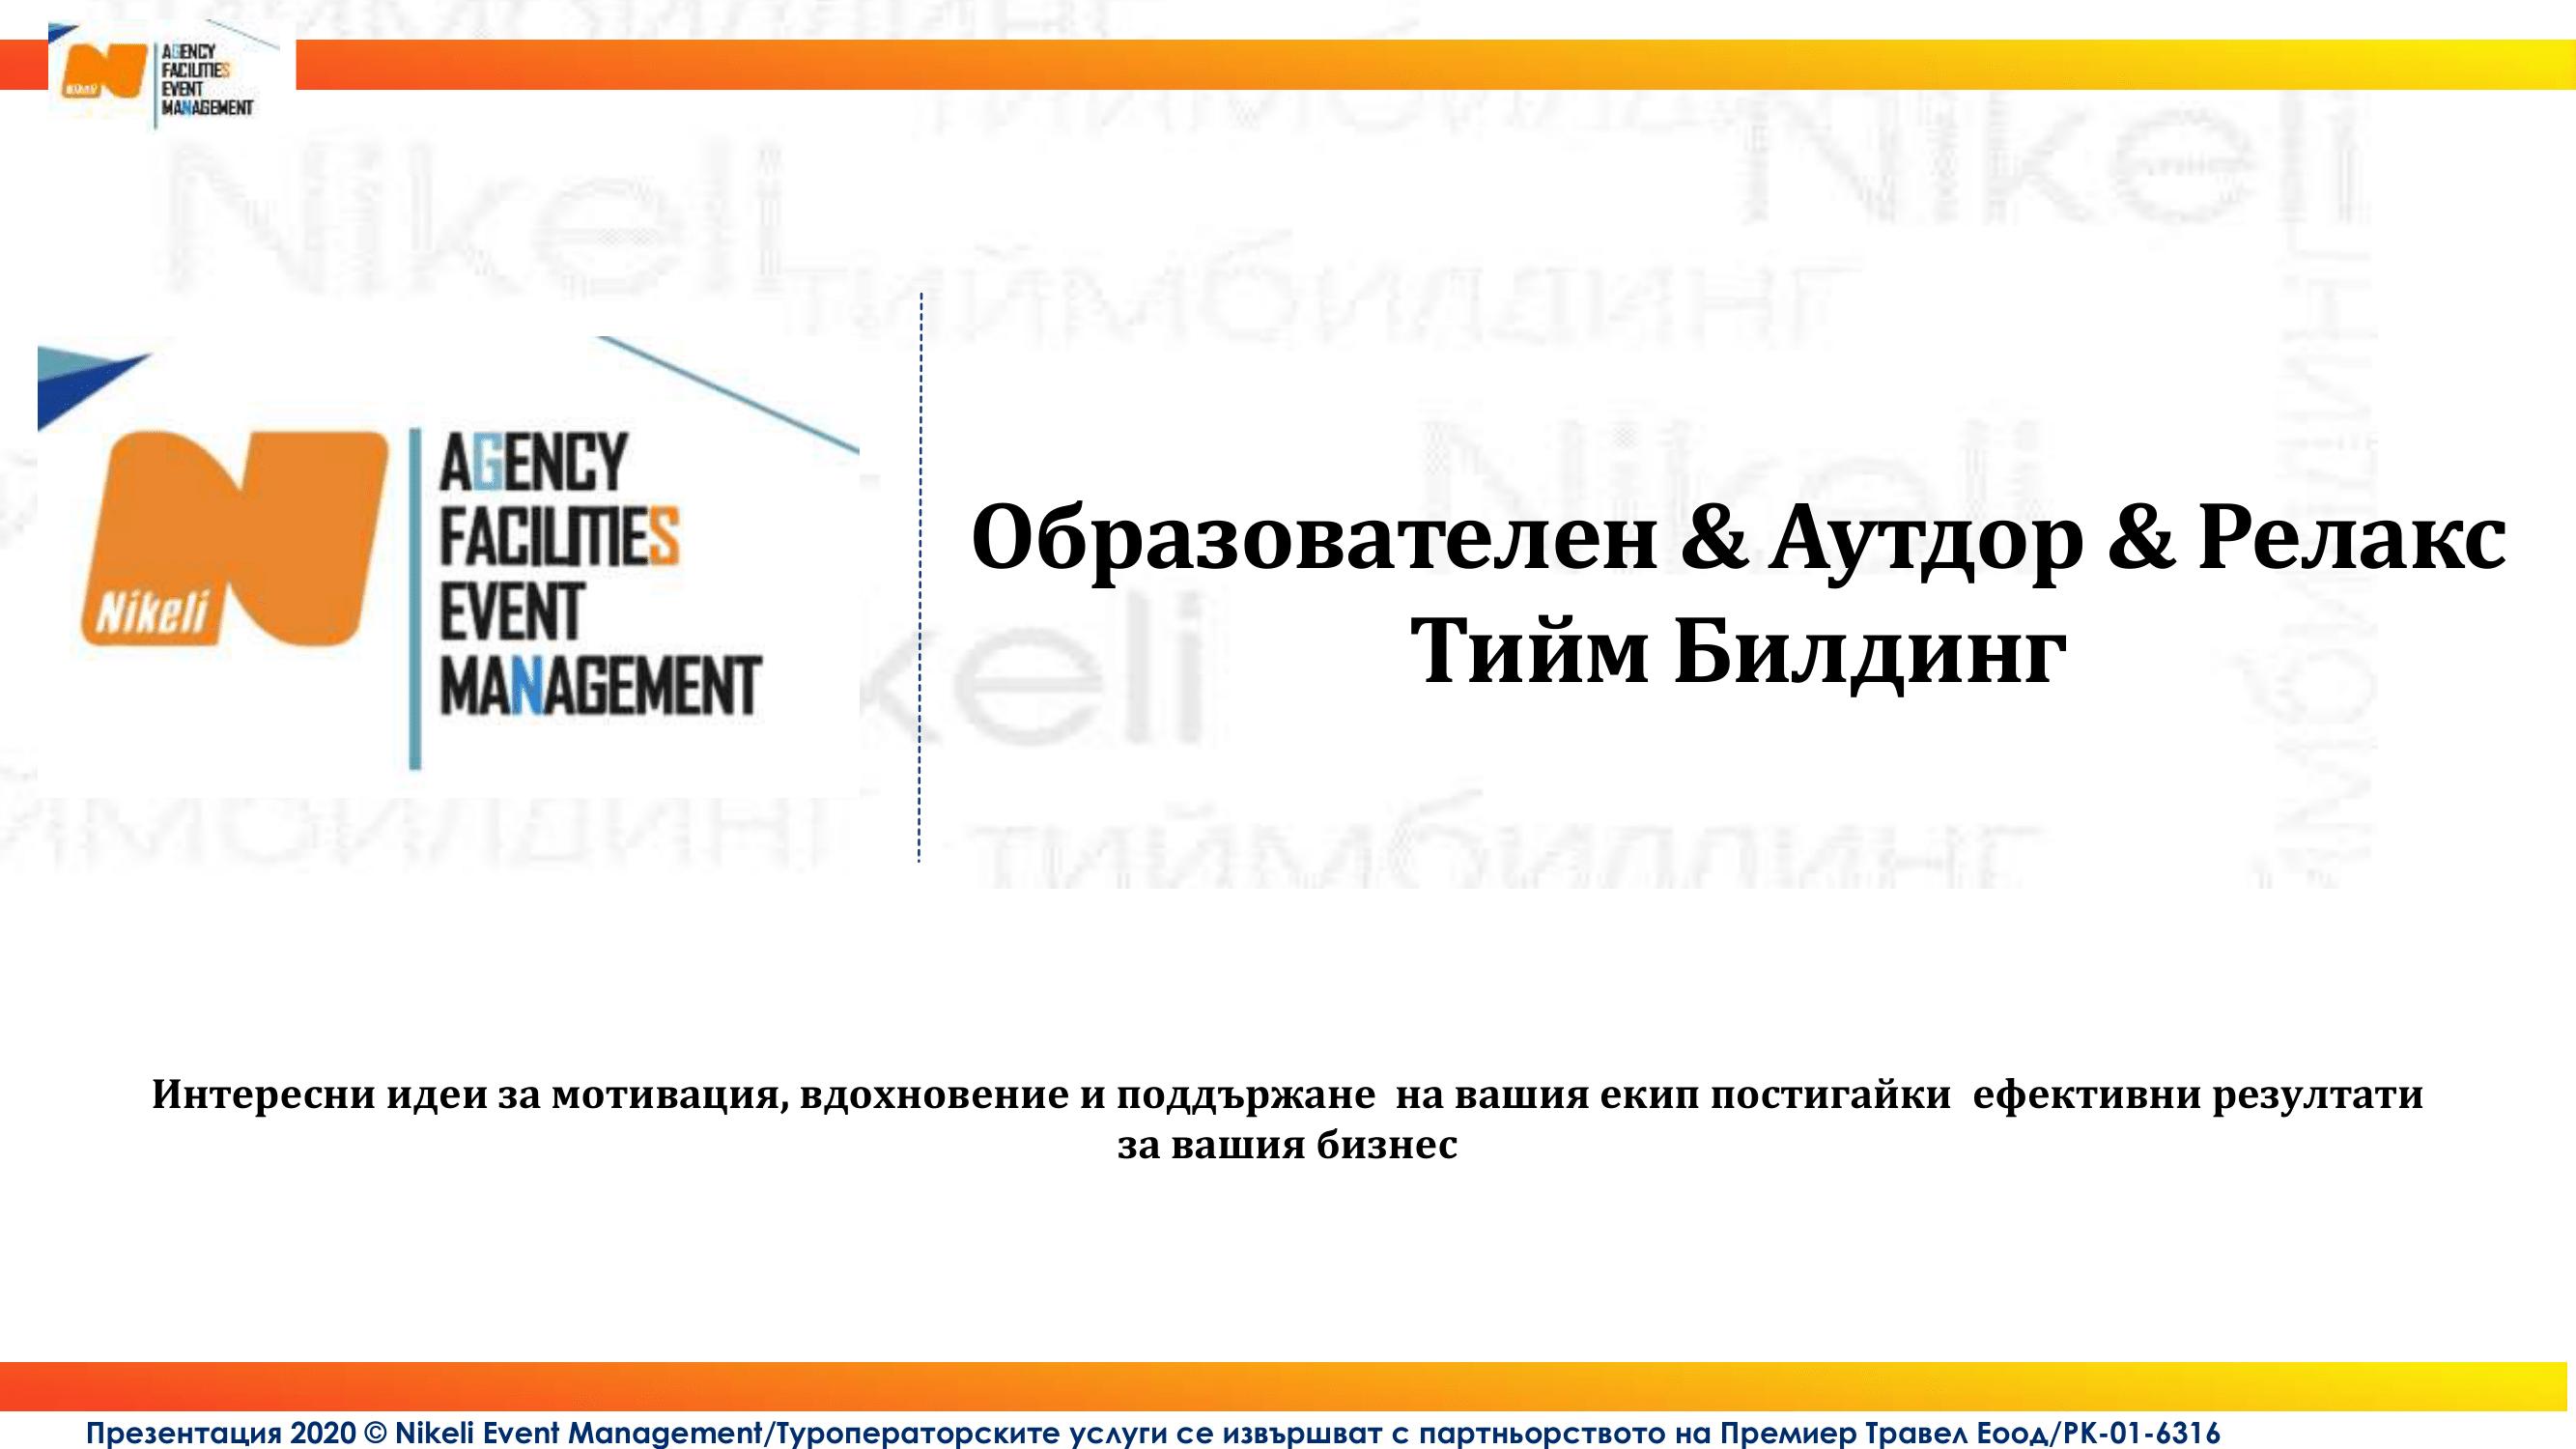 TeamBuilding-Nikeli-Event-Managemen-REA-2020-01